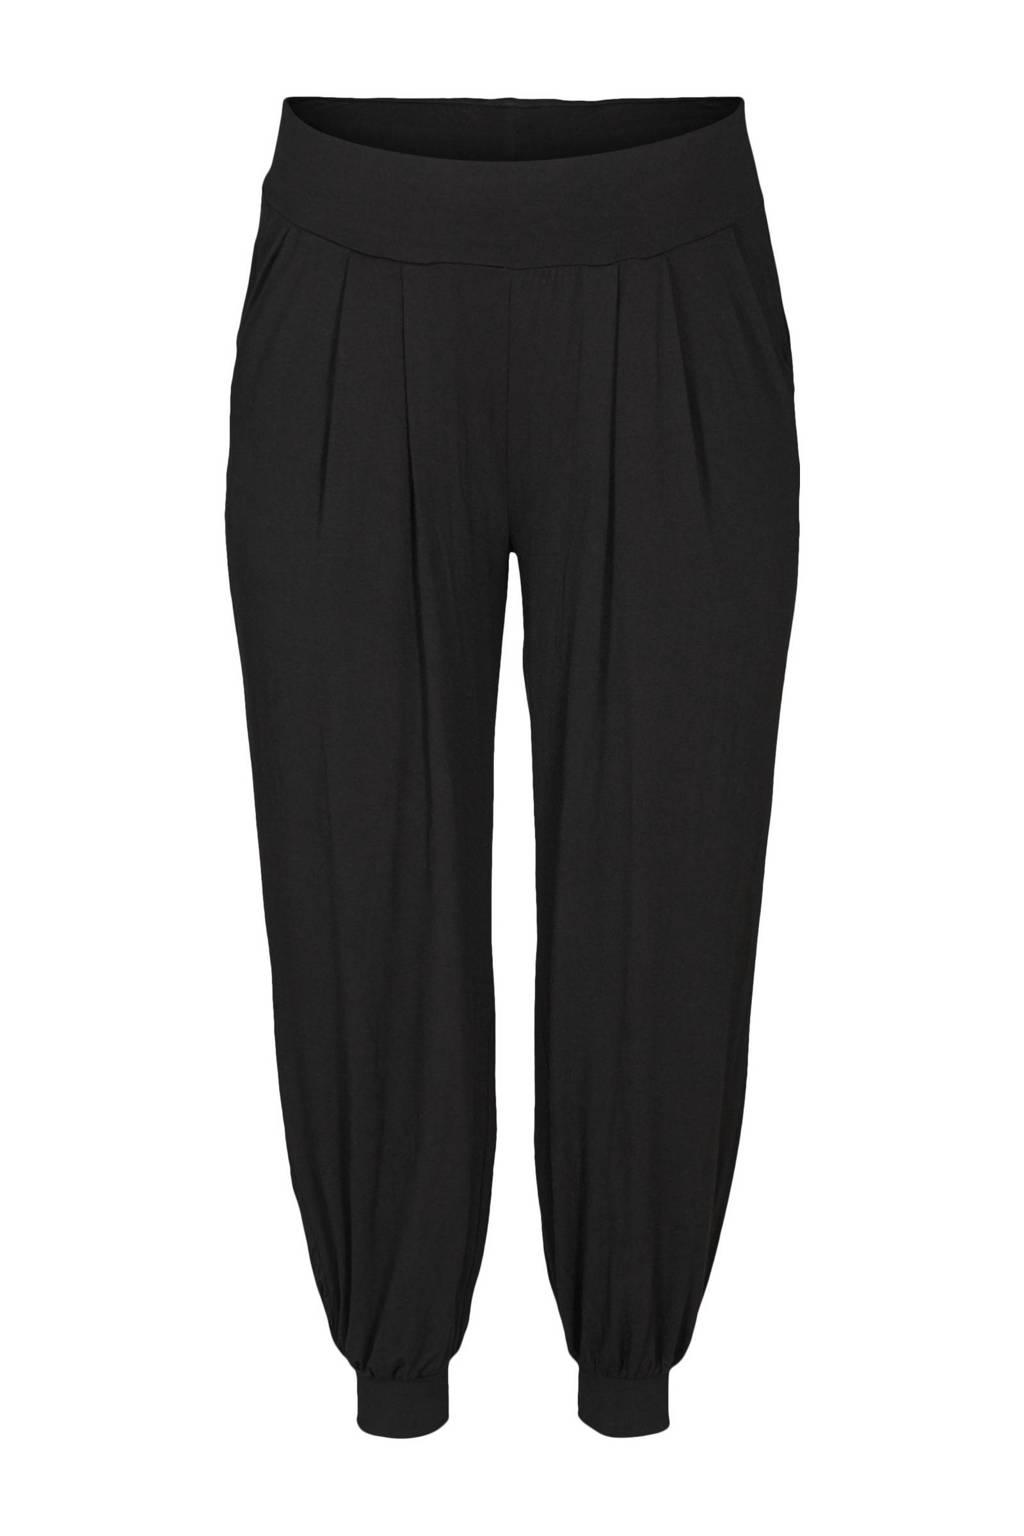 ACTIVE By Zizzi Plus Size trainingsbroek zwart, Zwart